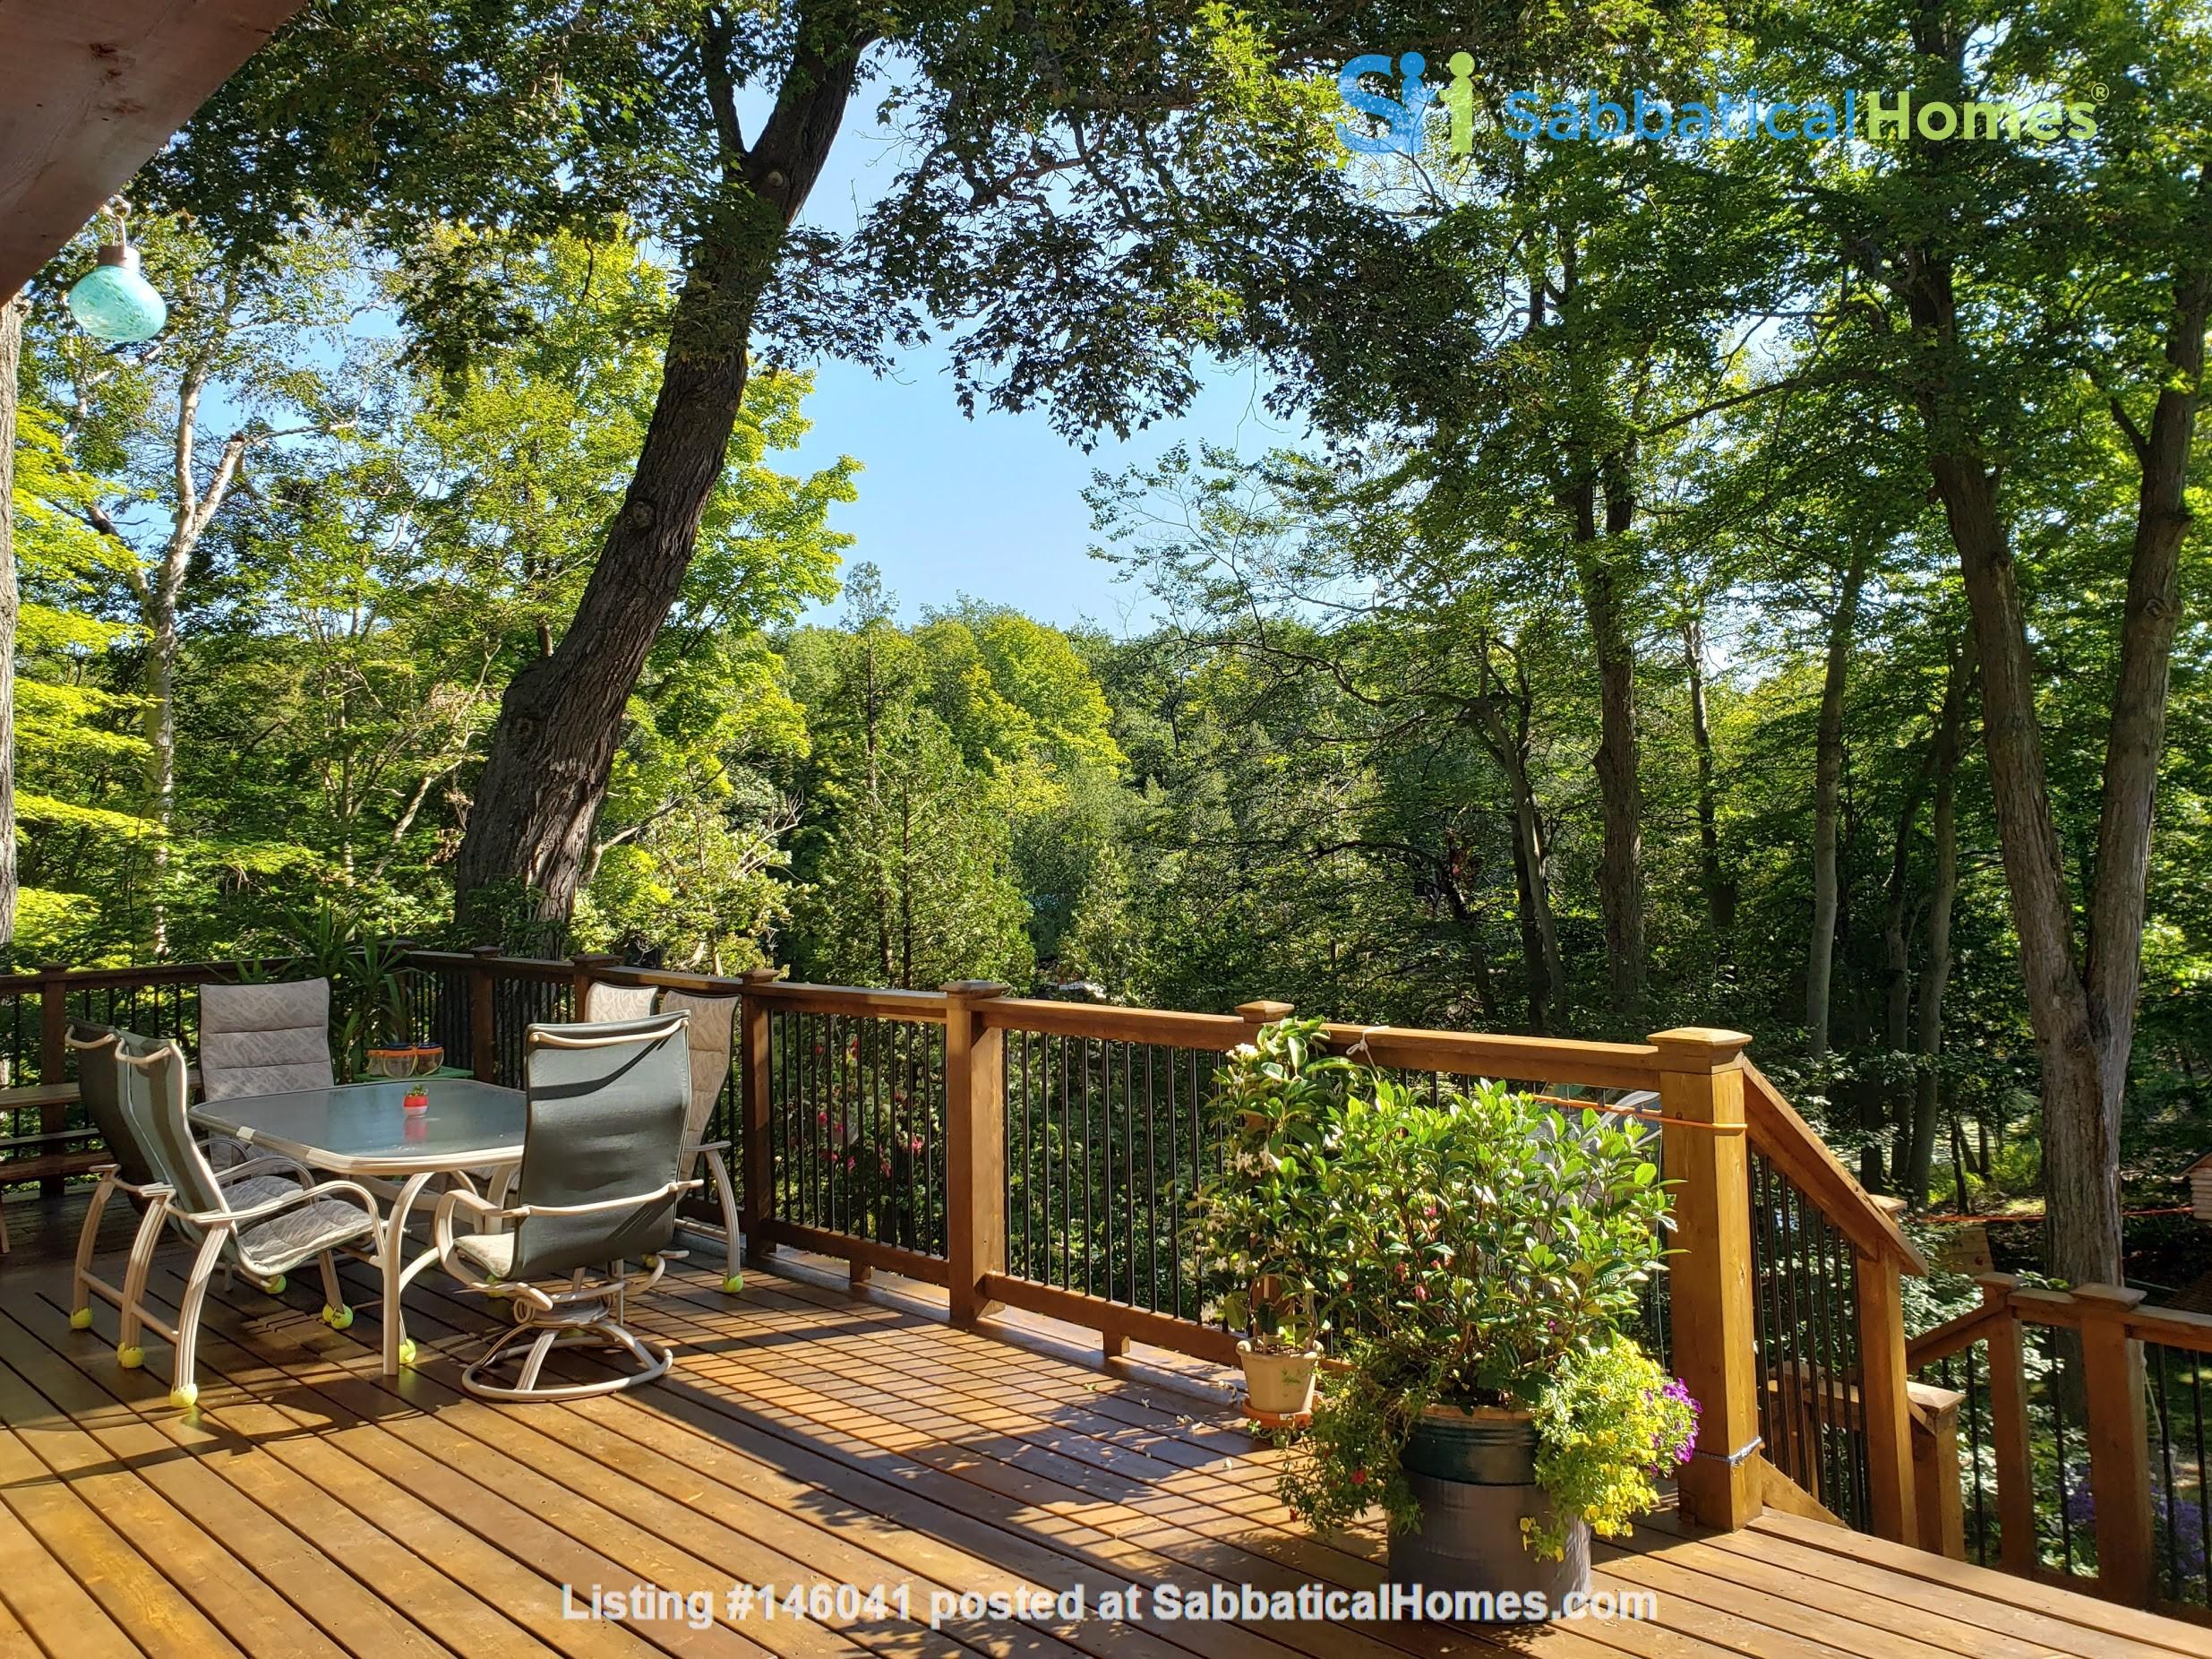 Beautiful nature retreat on lake Home Rental in  4